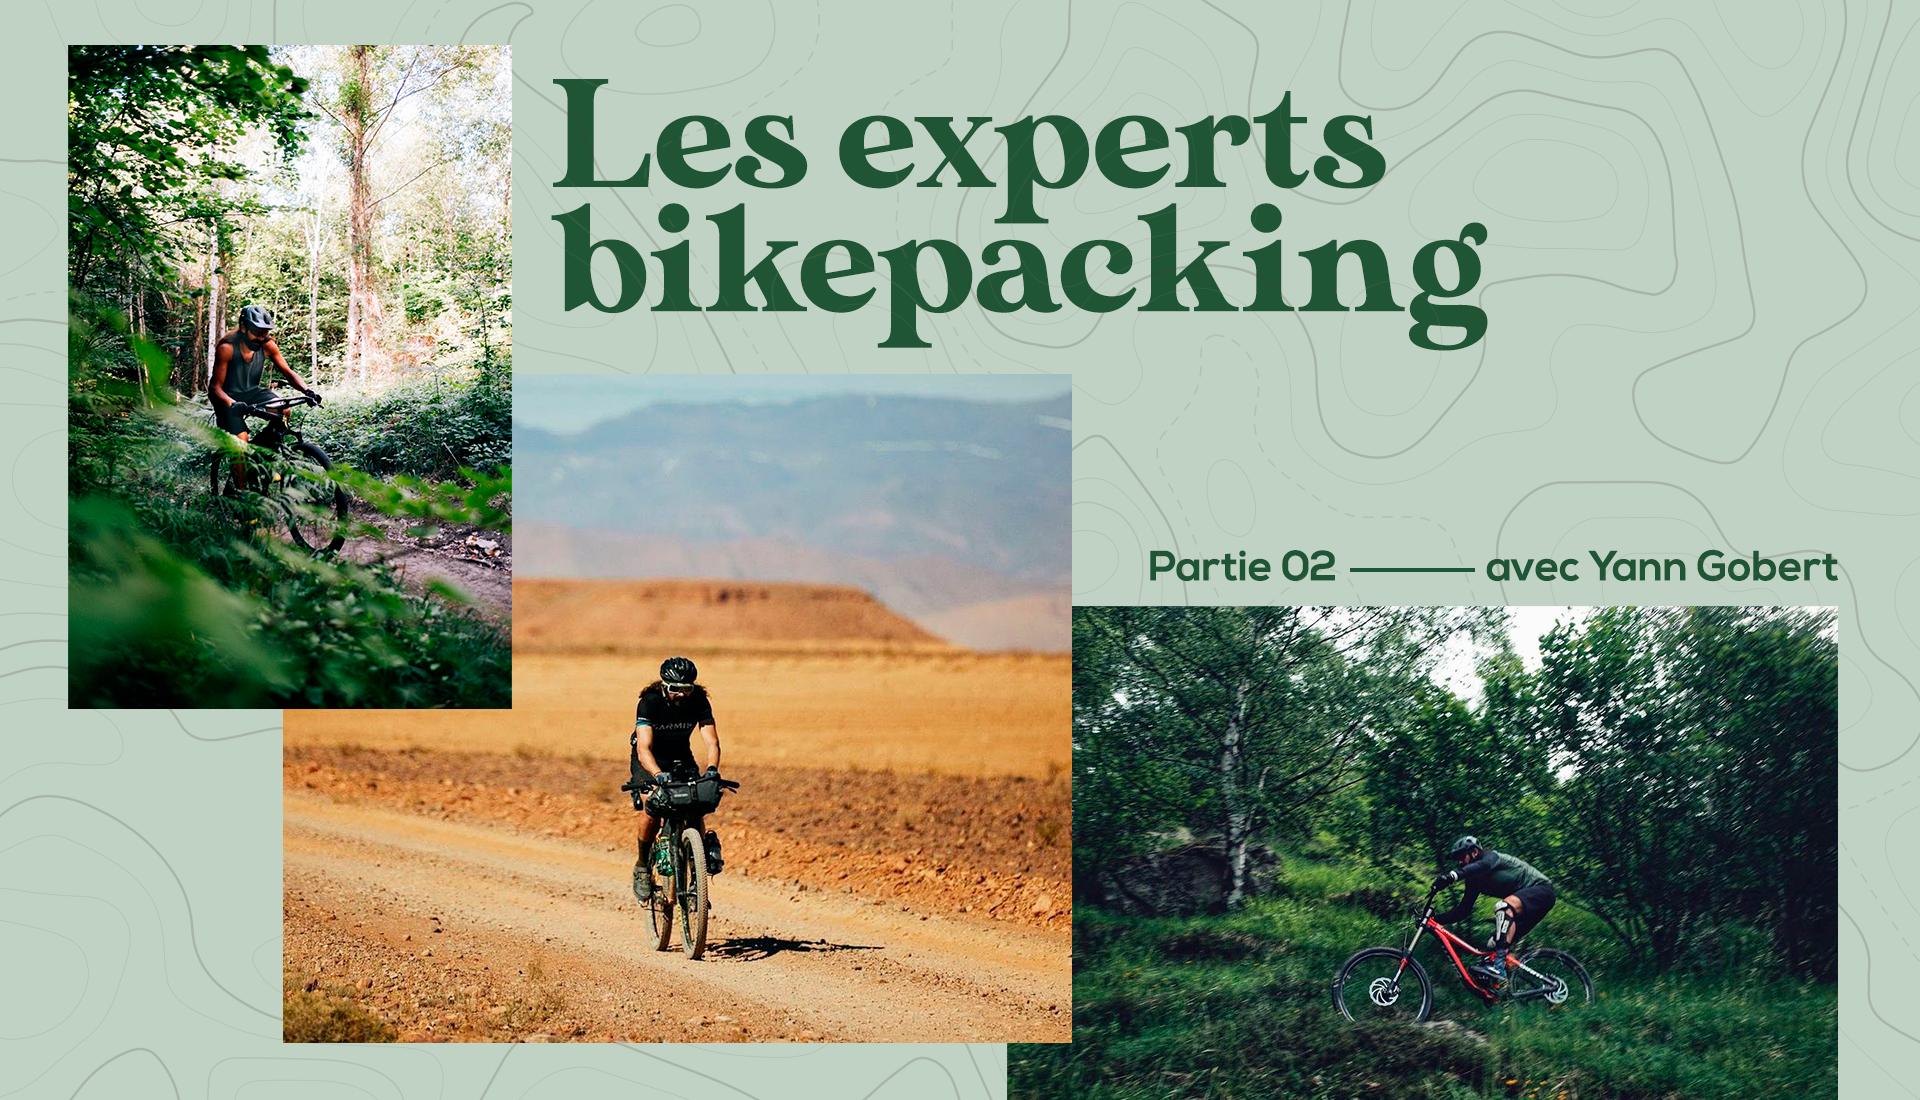 Les Experts Bikepacking : les conseils de Yann Gobert